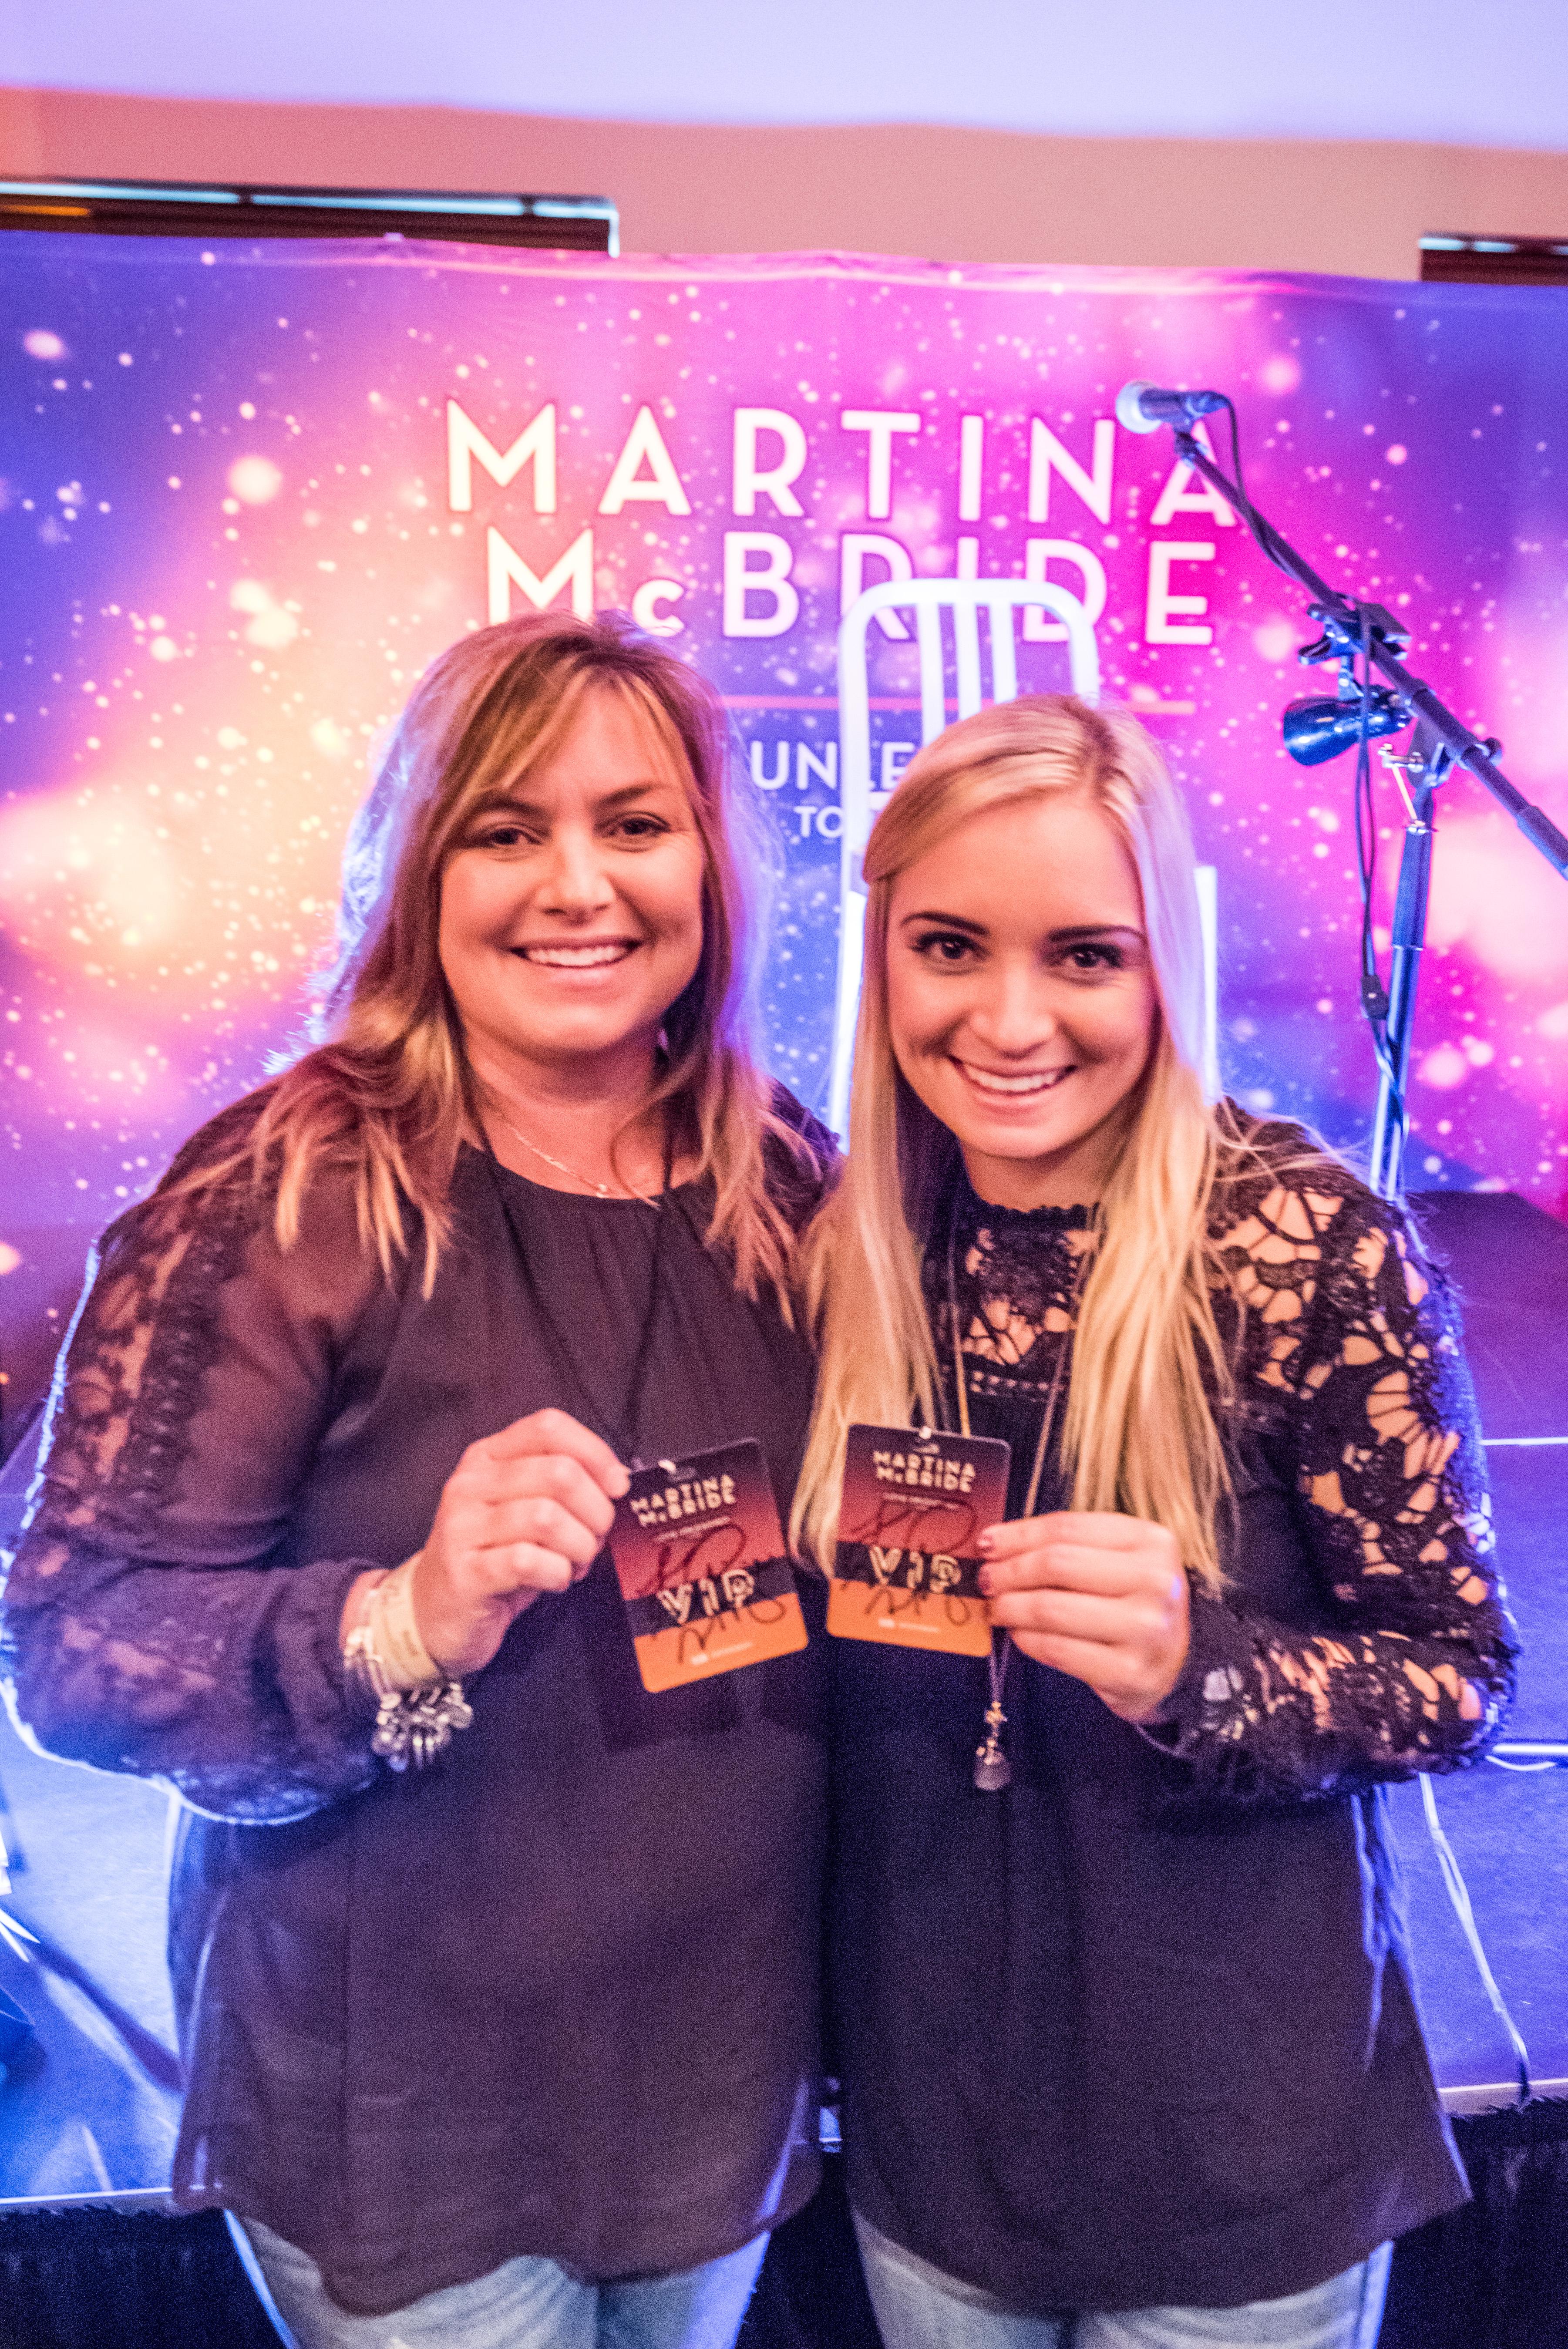 Martina Mcbride Fan Experiences